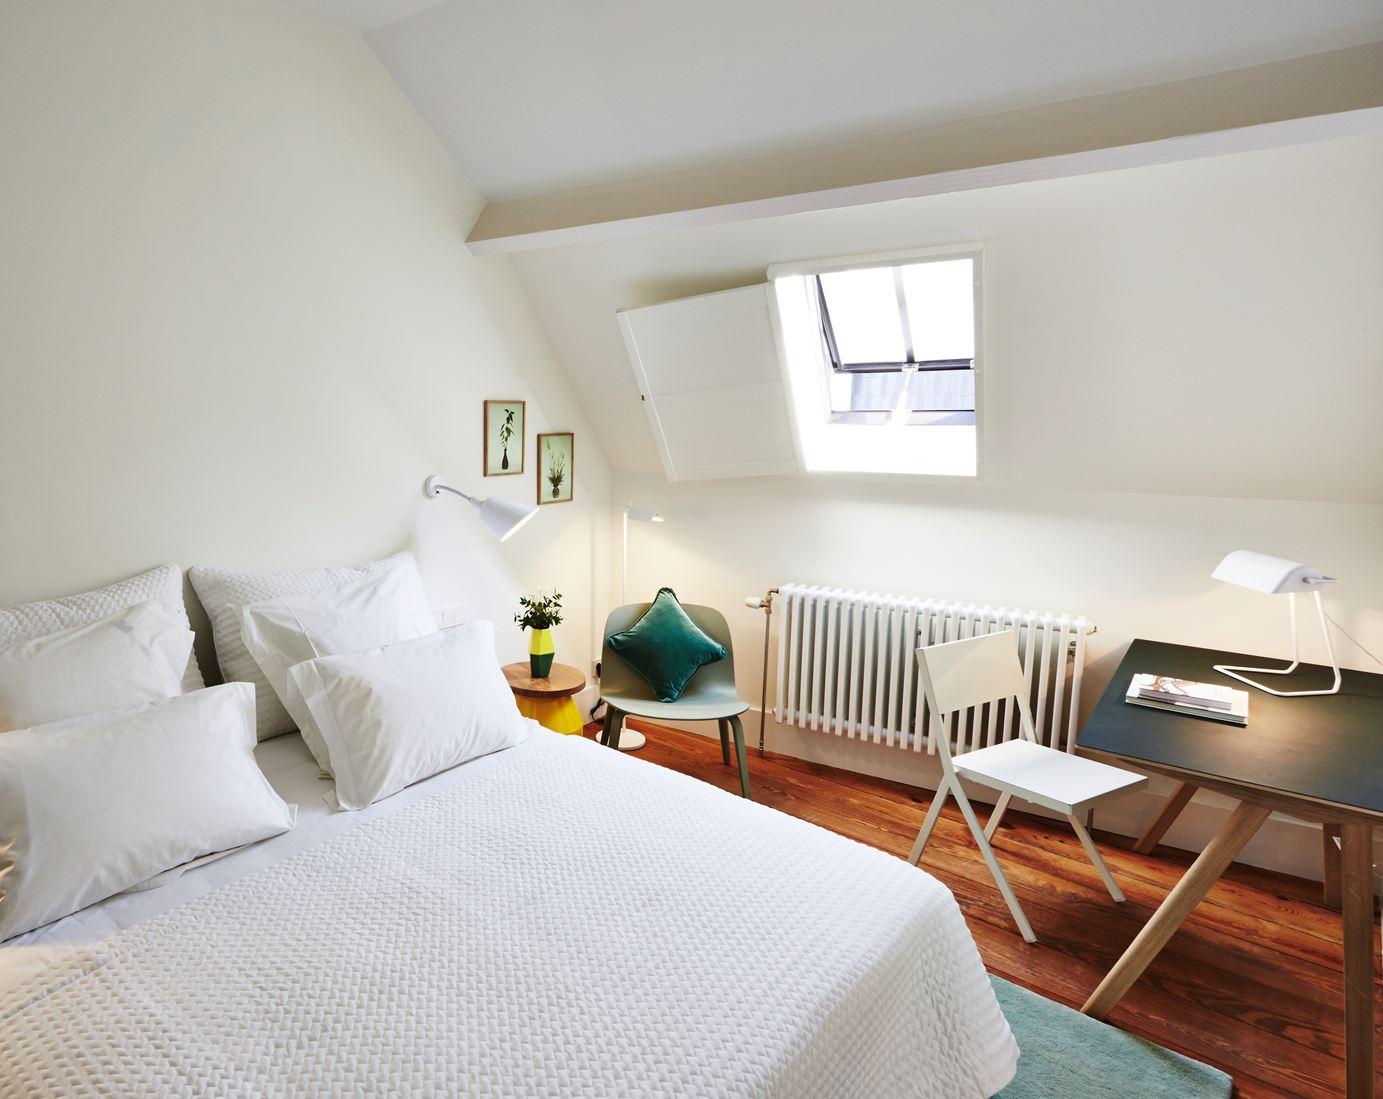 Un hotel con suite in mansarda for Planimetrie per aggiunta suite in legge